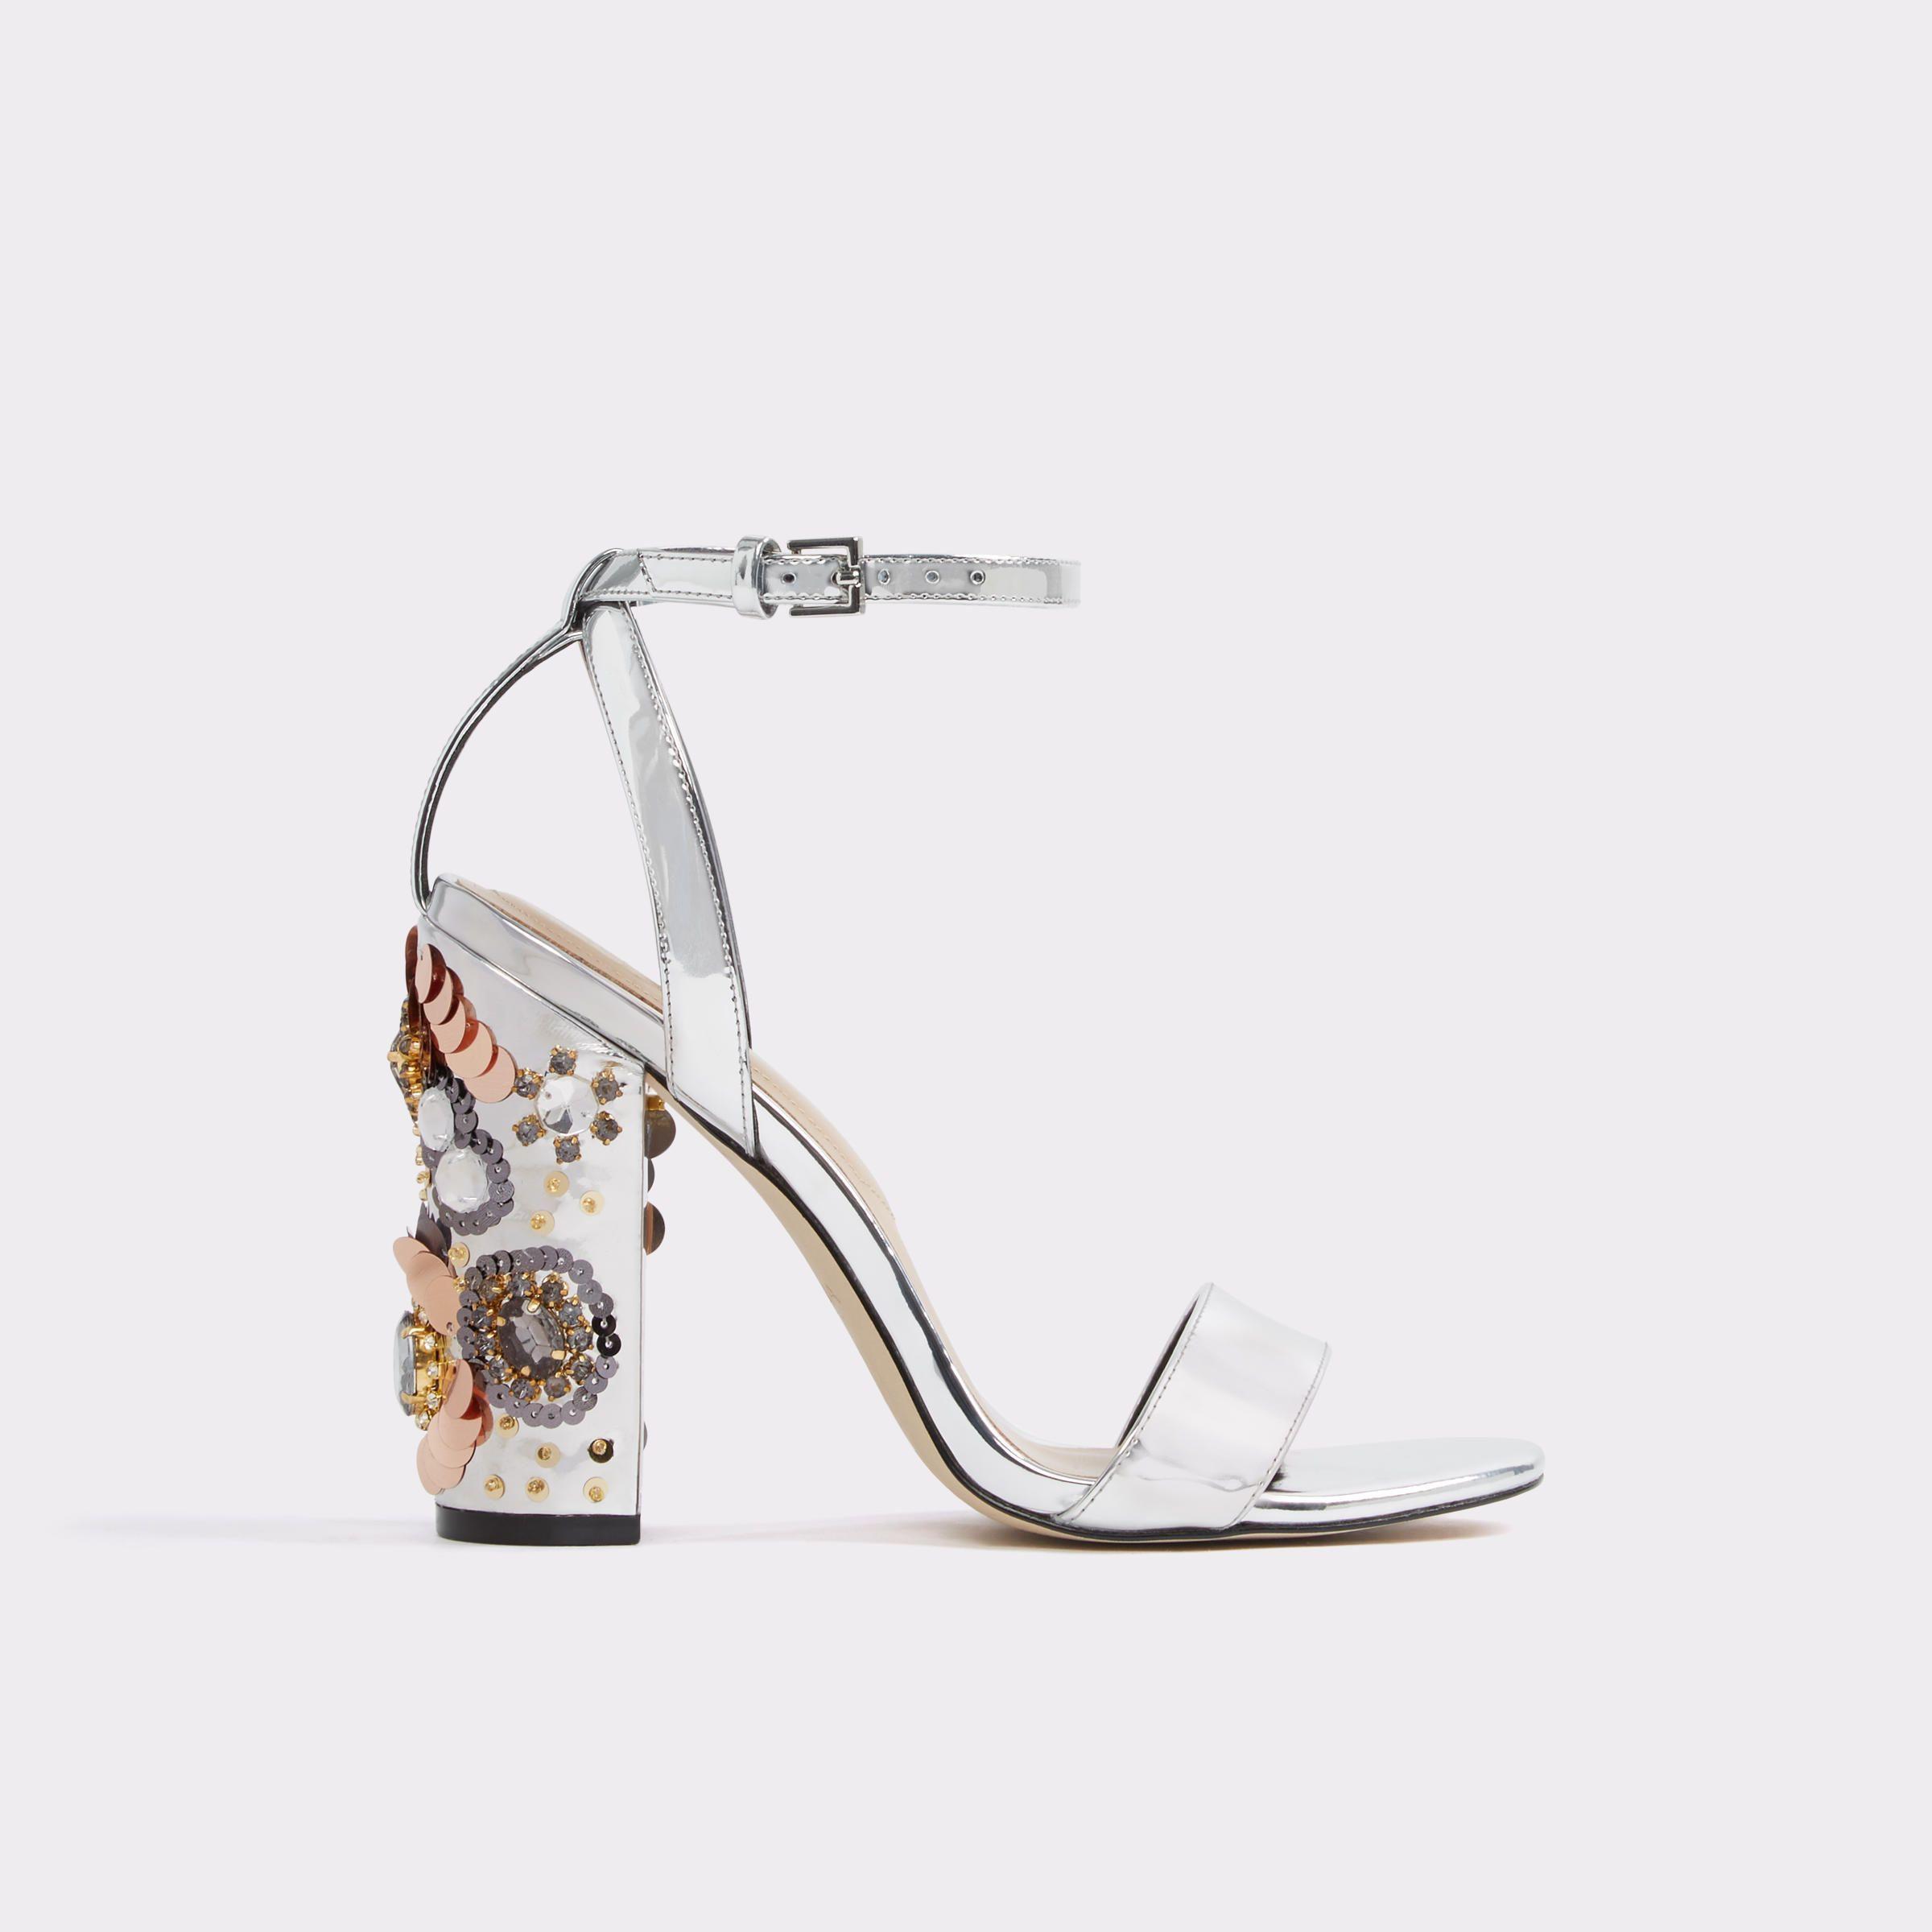 6646ae2f5a1 Luciaa silver by Aldo Shoes - Main